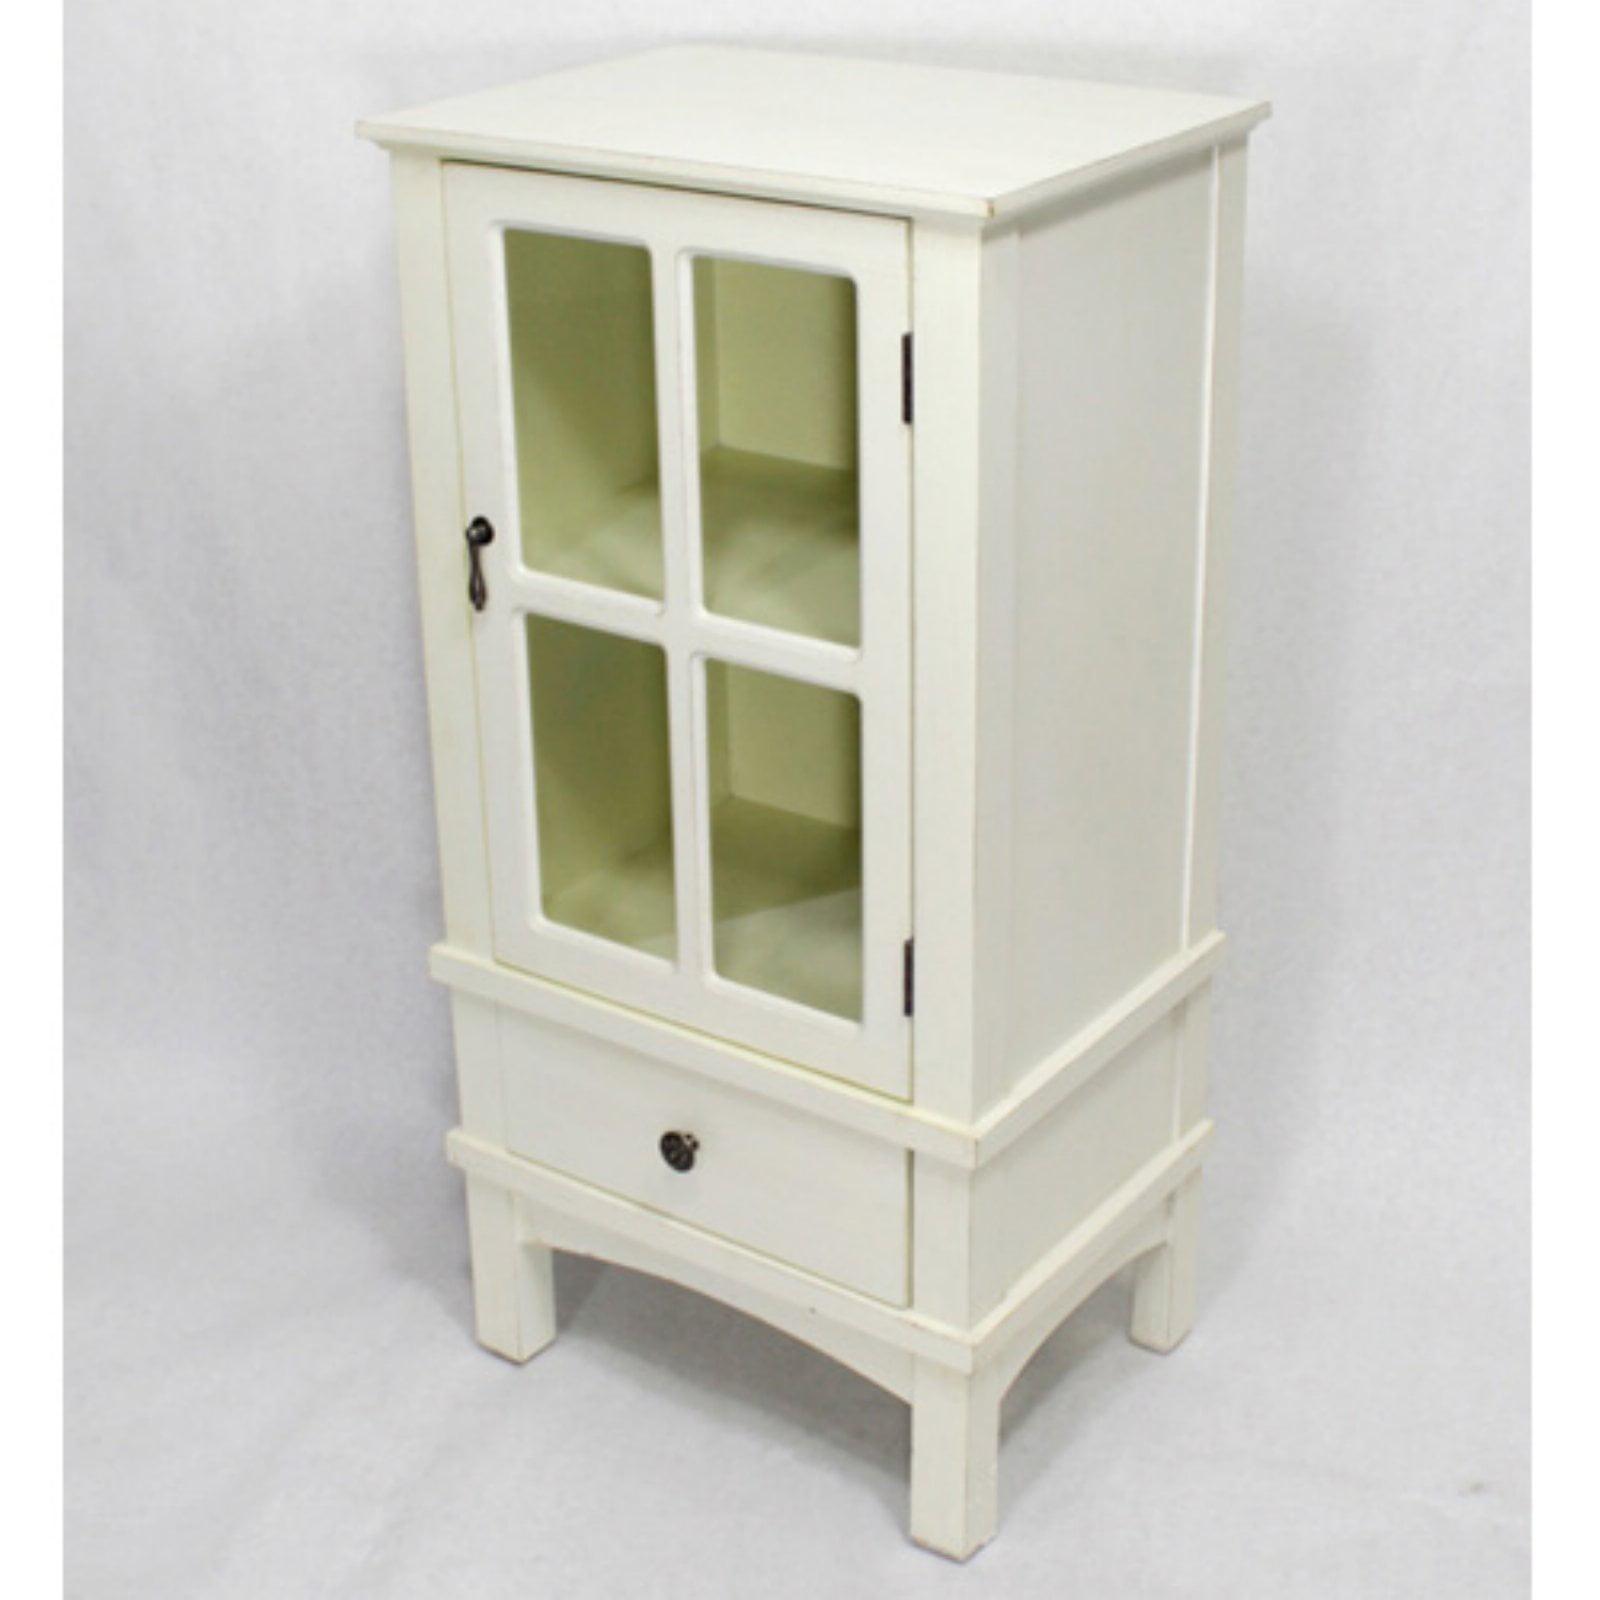 Heather Ann Creations Vivian Farmhouse Paned Glass Accent Cabinet